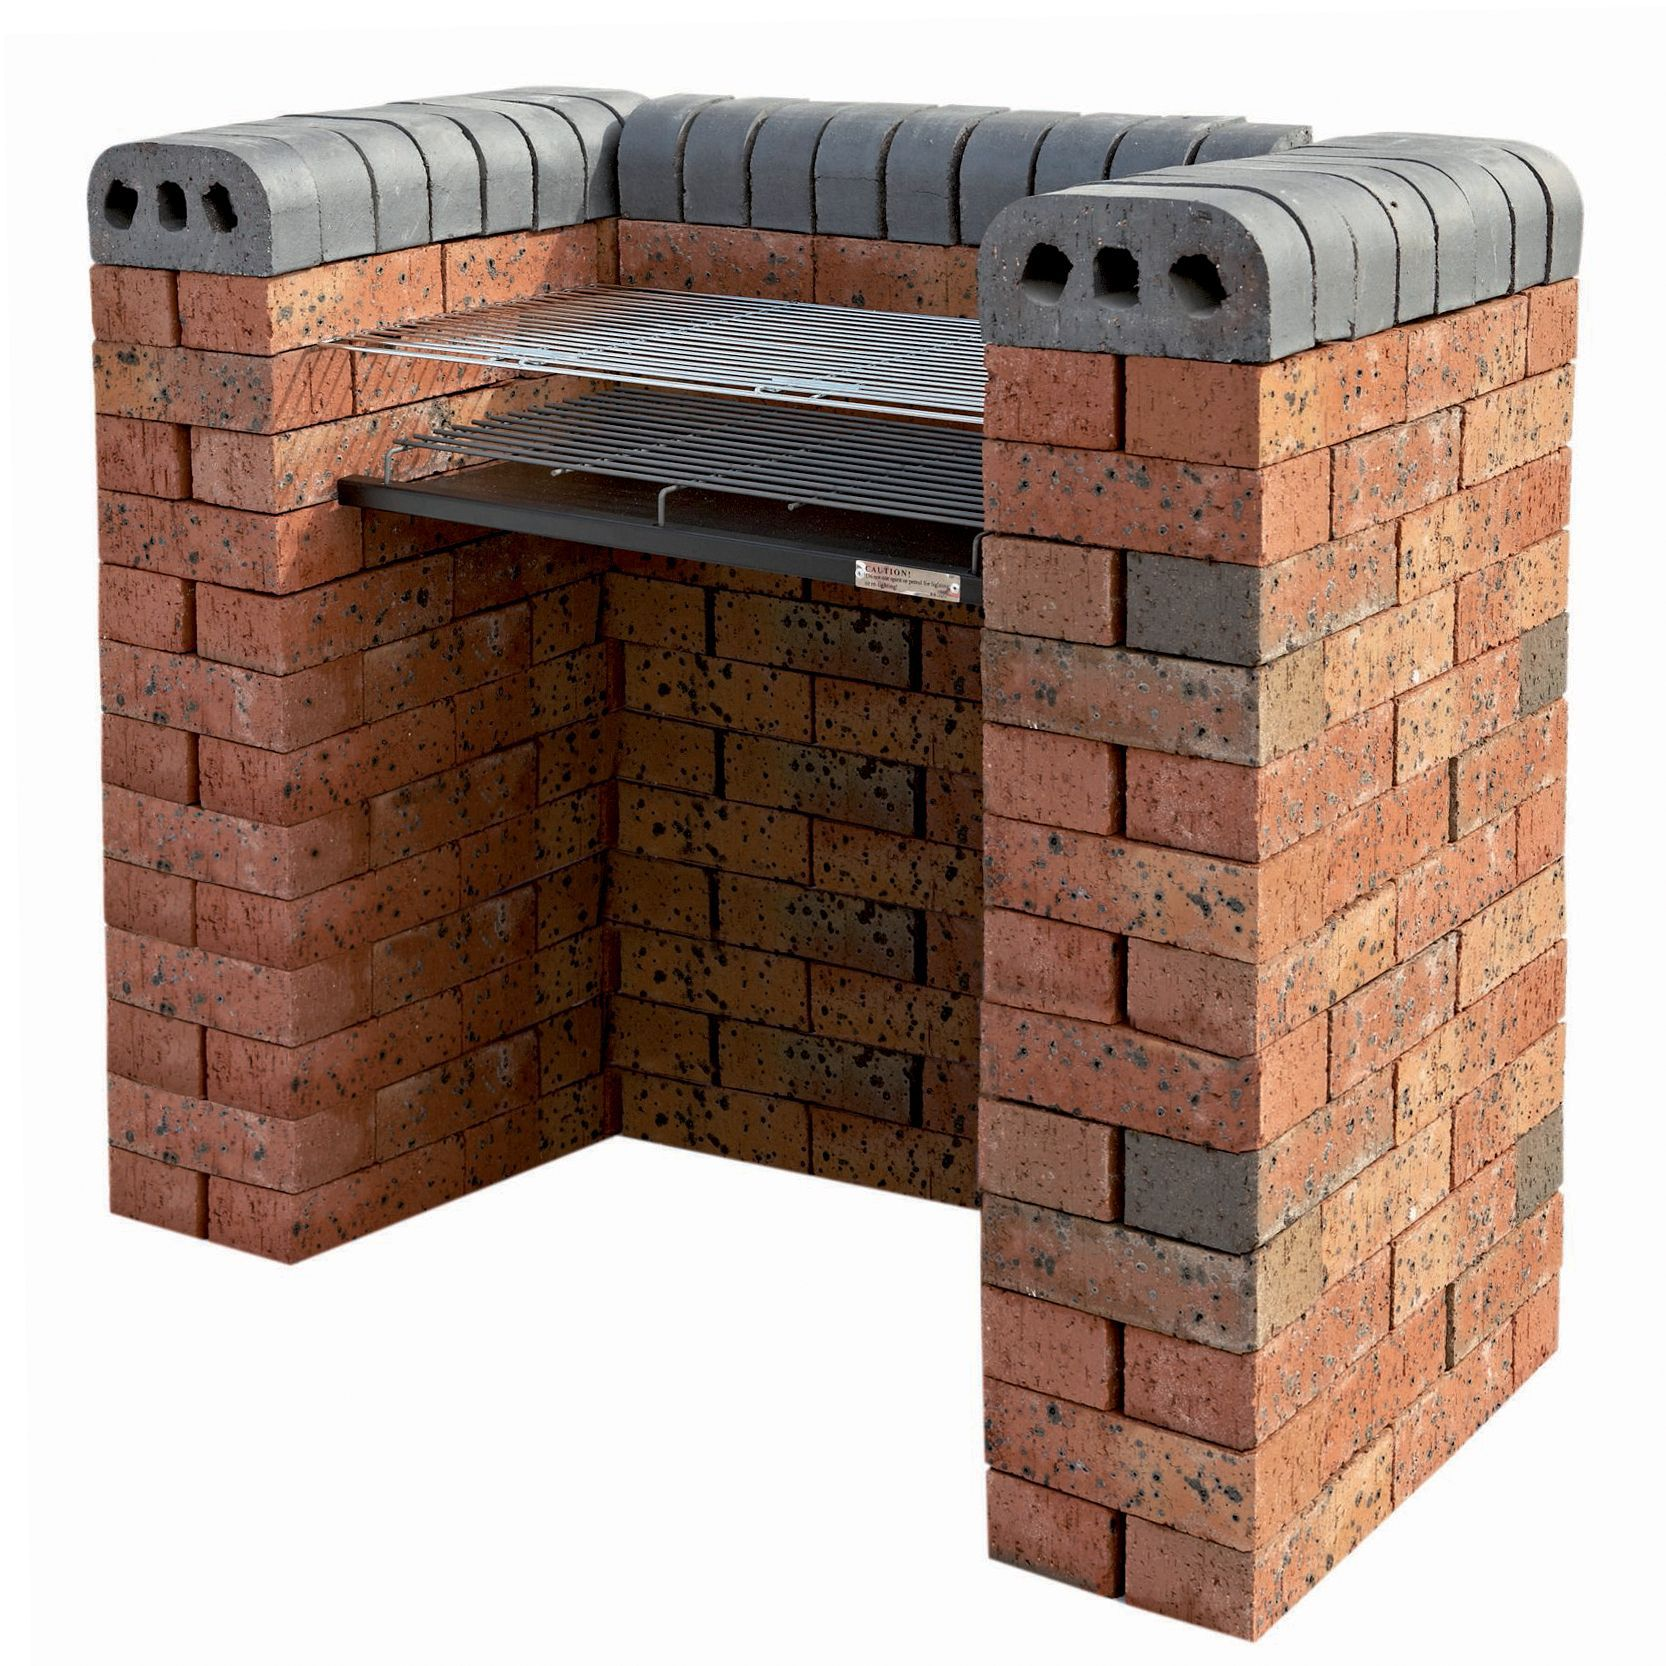 Nordend Charcoal Diy Barbecue | Departments | DIY at B&Q